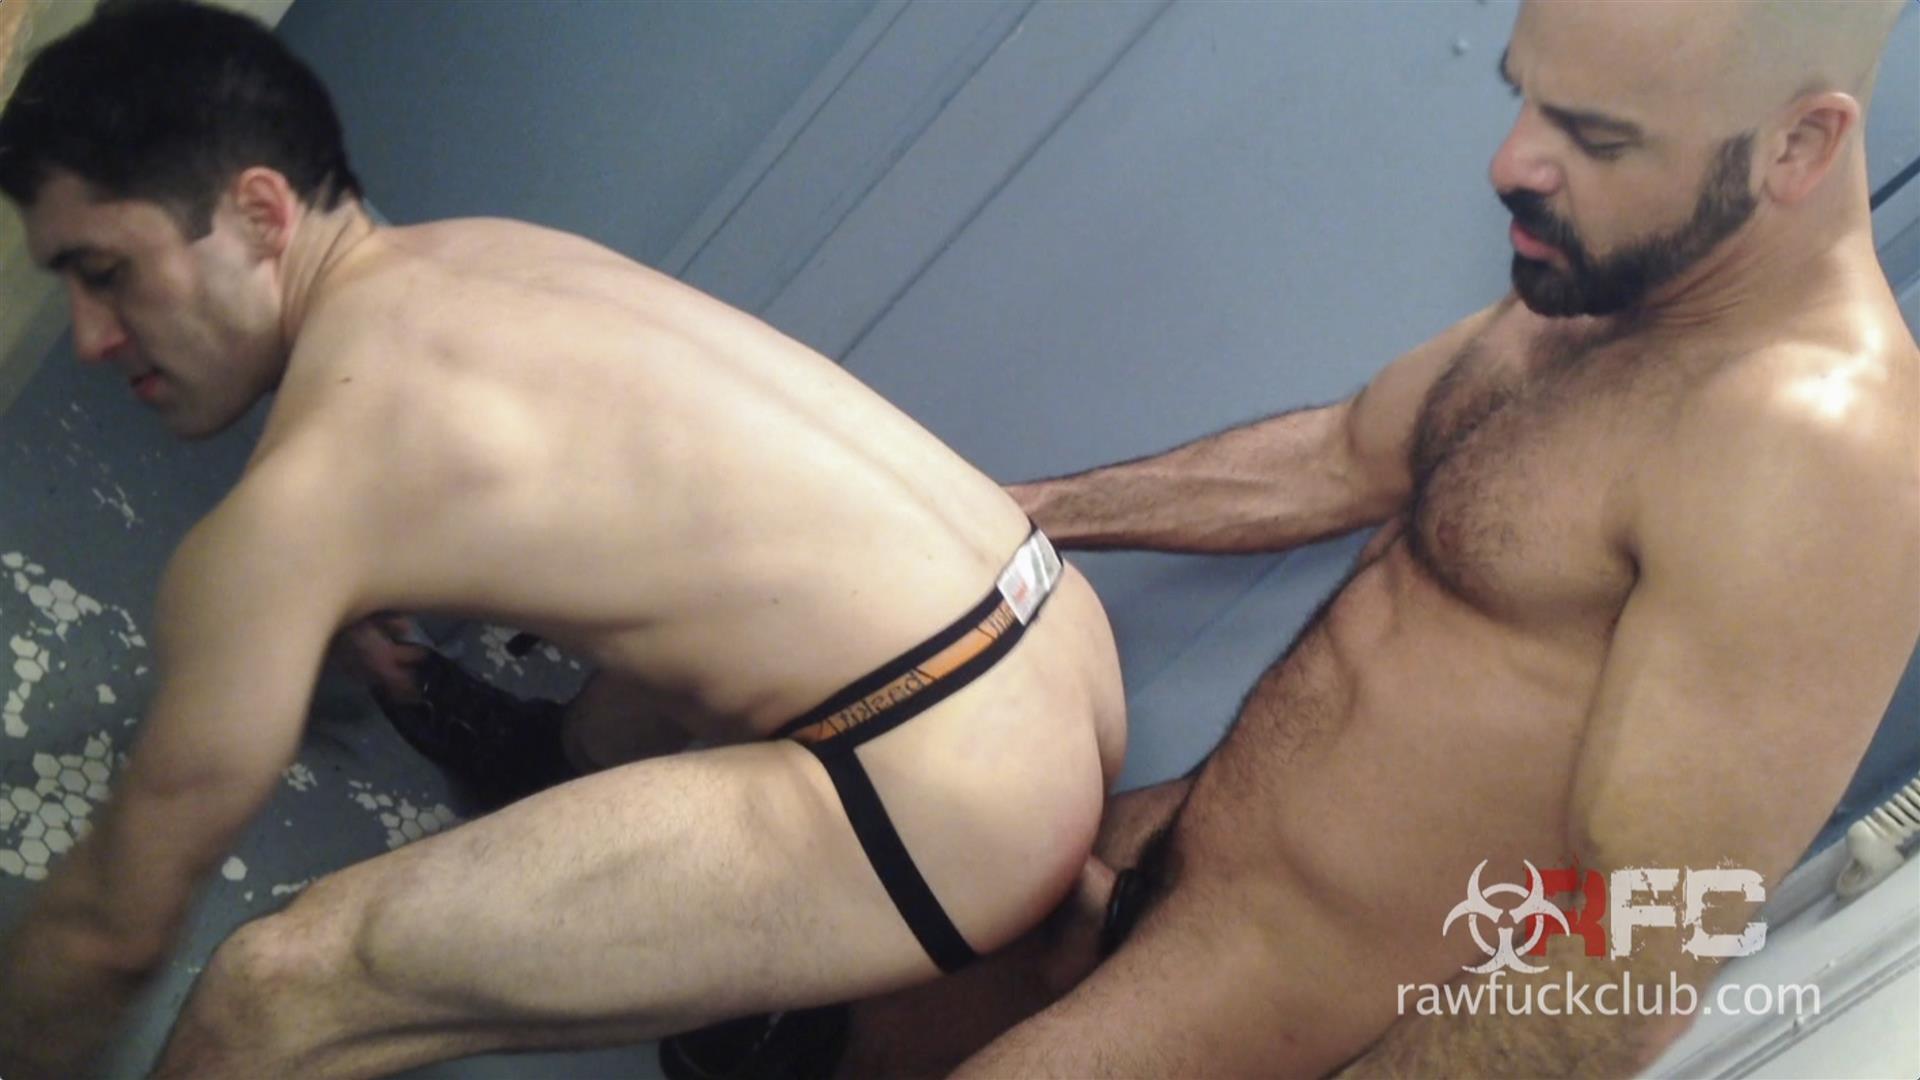 Raw-Fuck-Club-Adam-Russo-and-Kyle-Ferris-Anonymous-Bareback-Sex-Amateur-Gay-Porn-6 Adam Russo Barebacking A Stranger In A Dirty Bar Bathroom